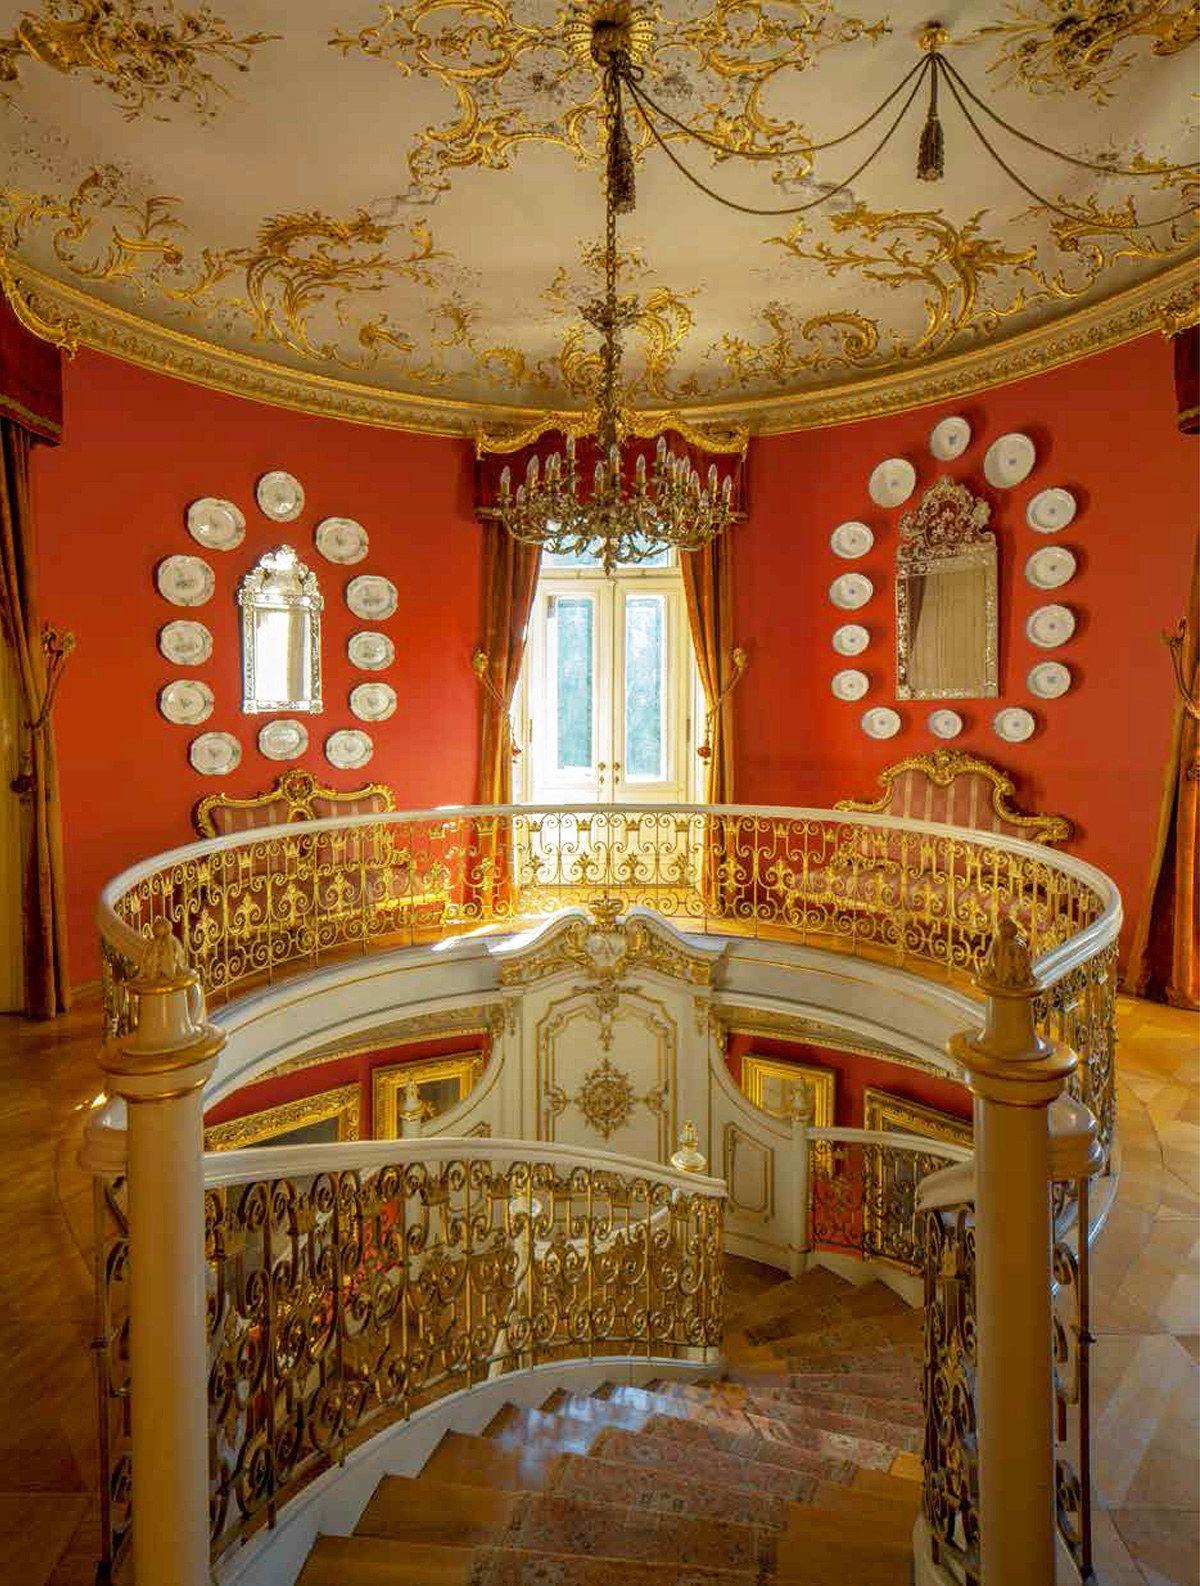 Tour The 500 Room Schloss St Emmeram Estate In Germany Palace Interior Castles Interior Beautiful Interior Design